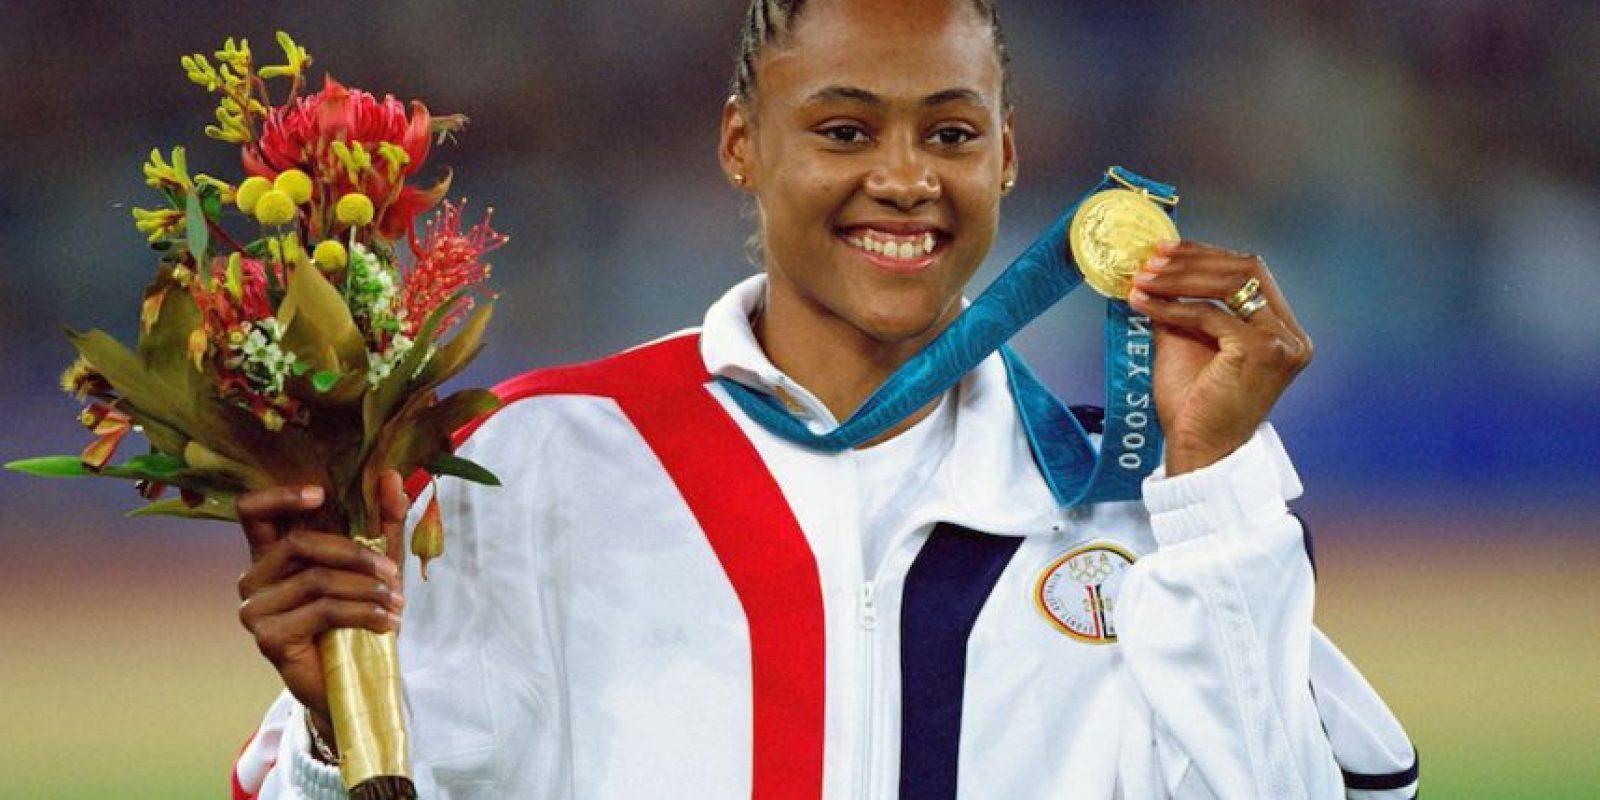 Marion Jones, exatleta estadounidense. Foto:Getty Images